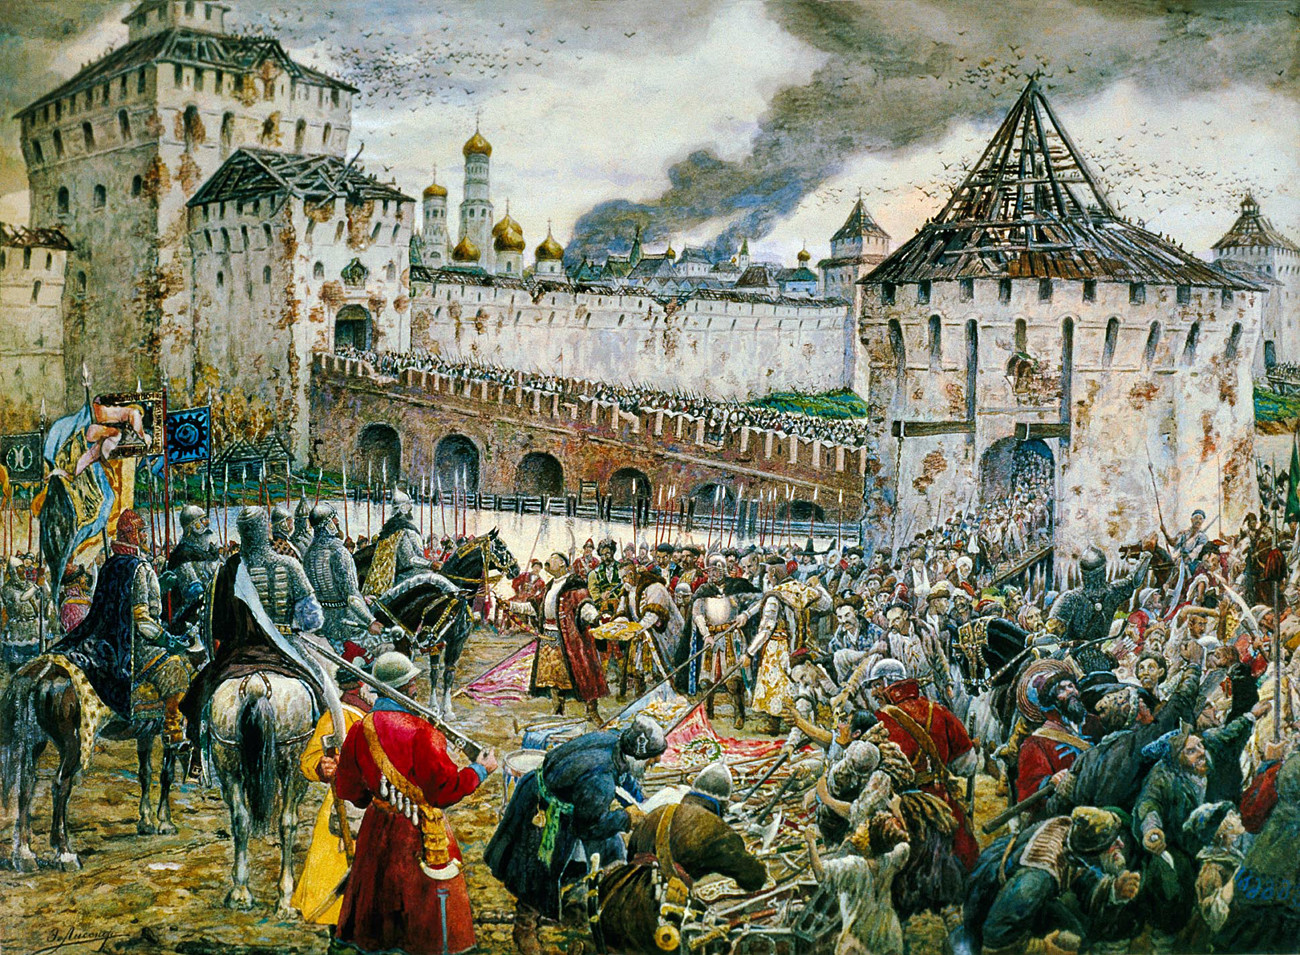 """Poloneses entregam Kremlin ao príncipe Pojárski em 1612"